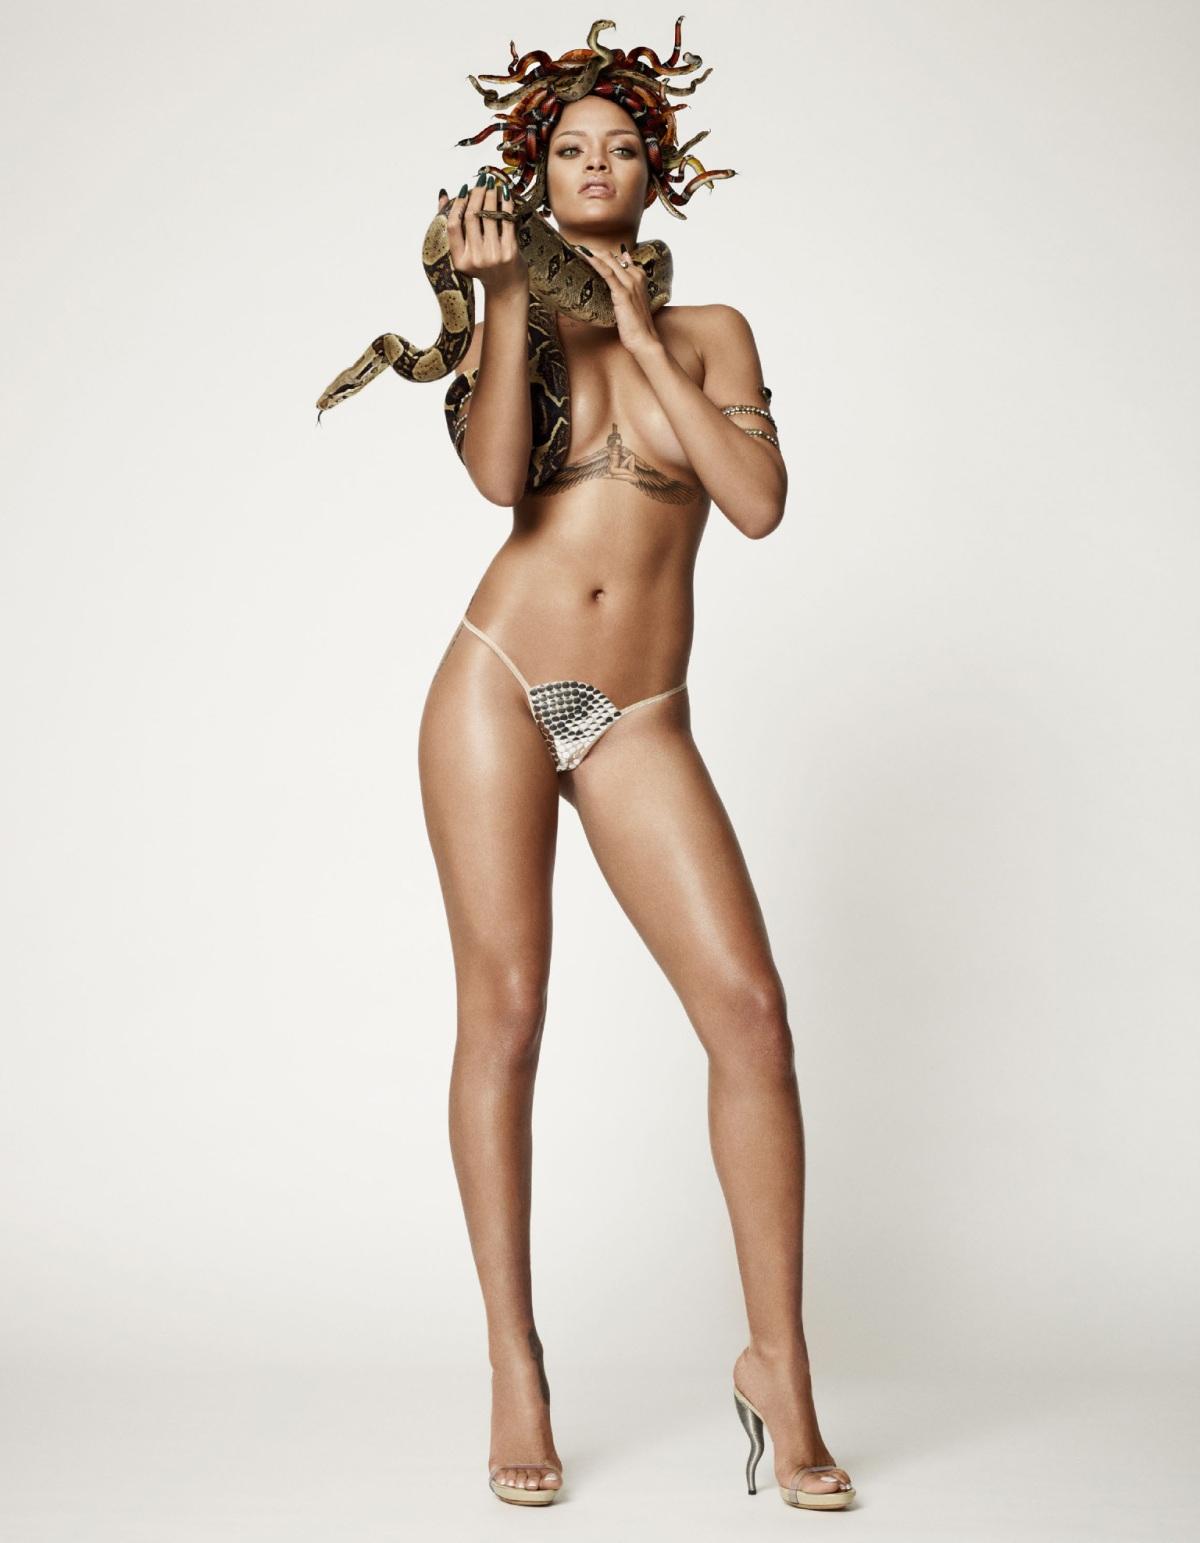 http://drewbmac.files.wordpress.com/2013/11/rihanna-as-naked-medusa-for-british-gqs-25th-anniversary-issue-06.jpg?w=1200